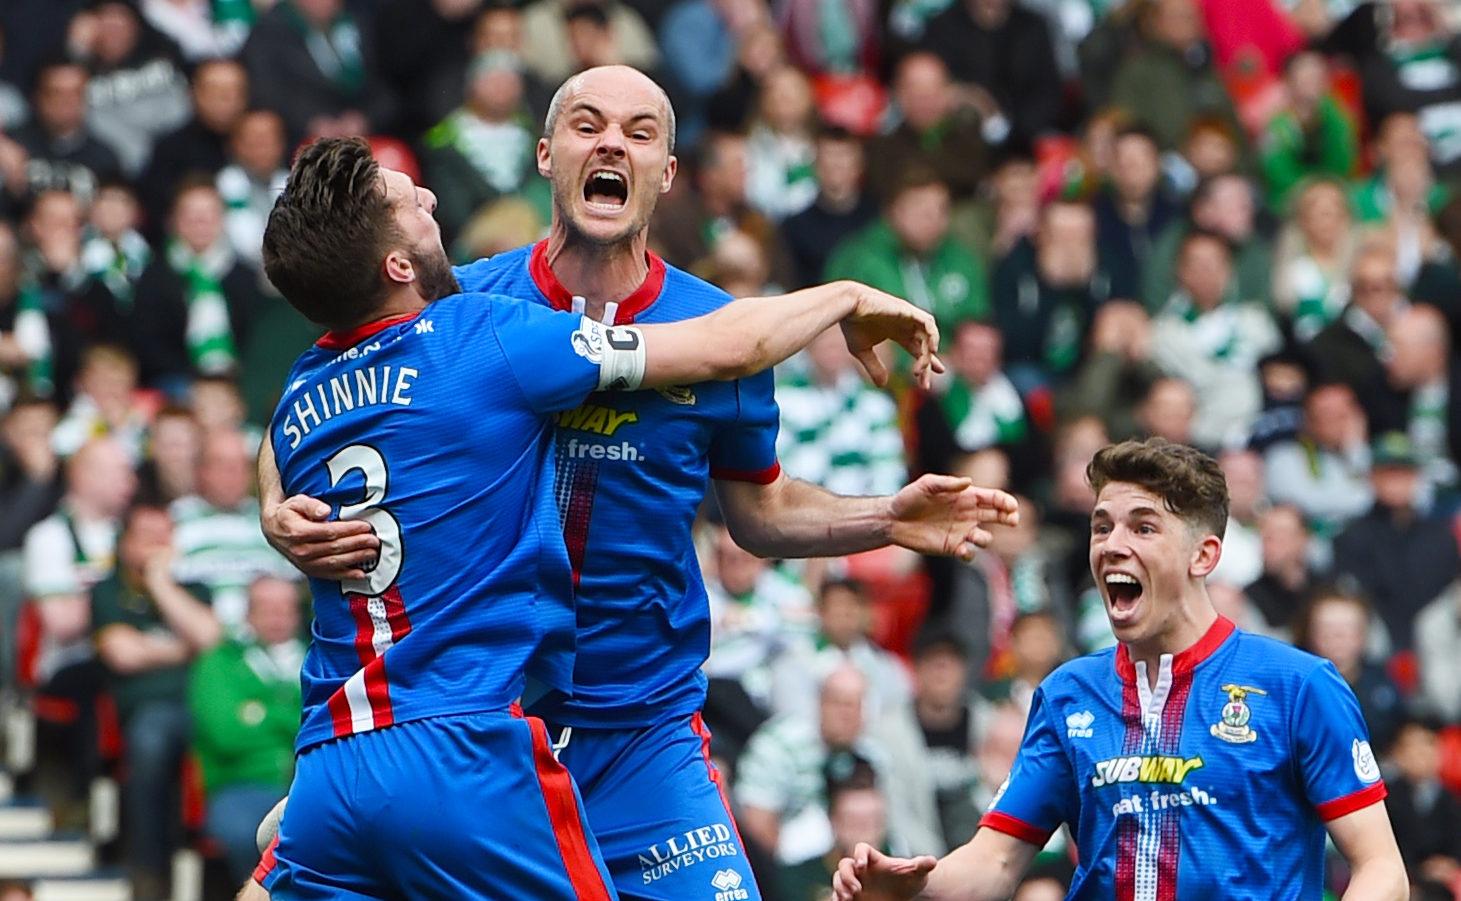 David Raven celebrates his goal against Celtic with Graeme Shinnie.